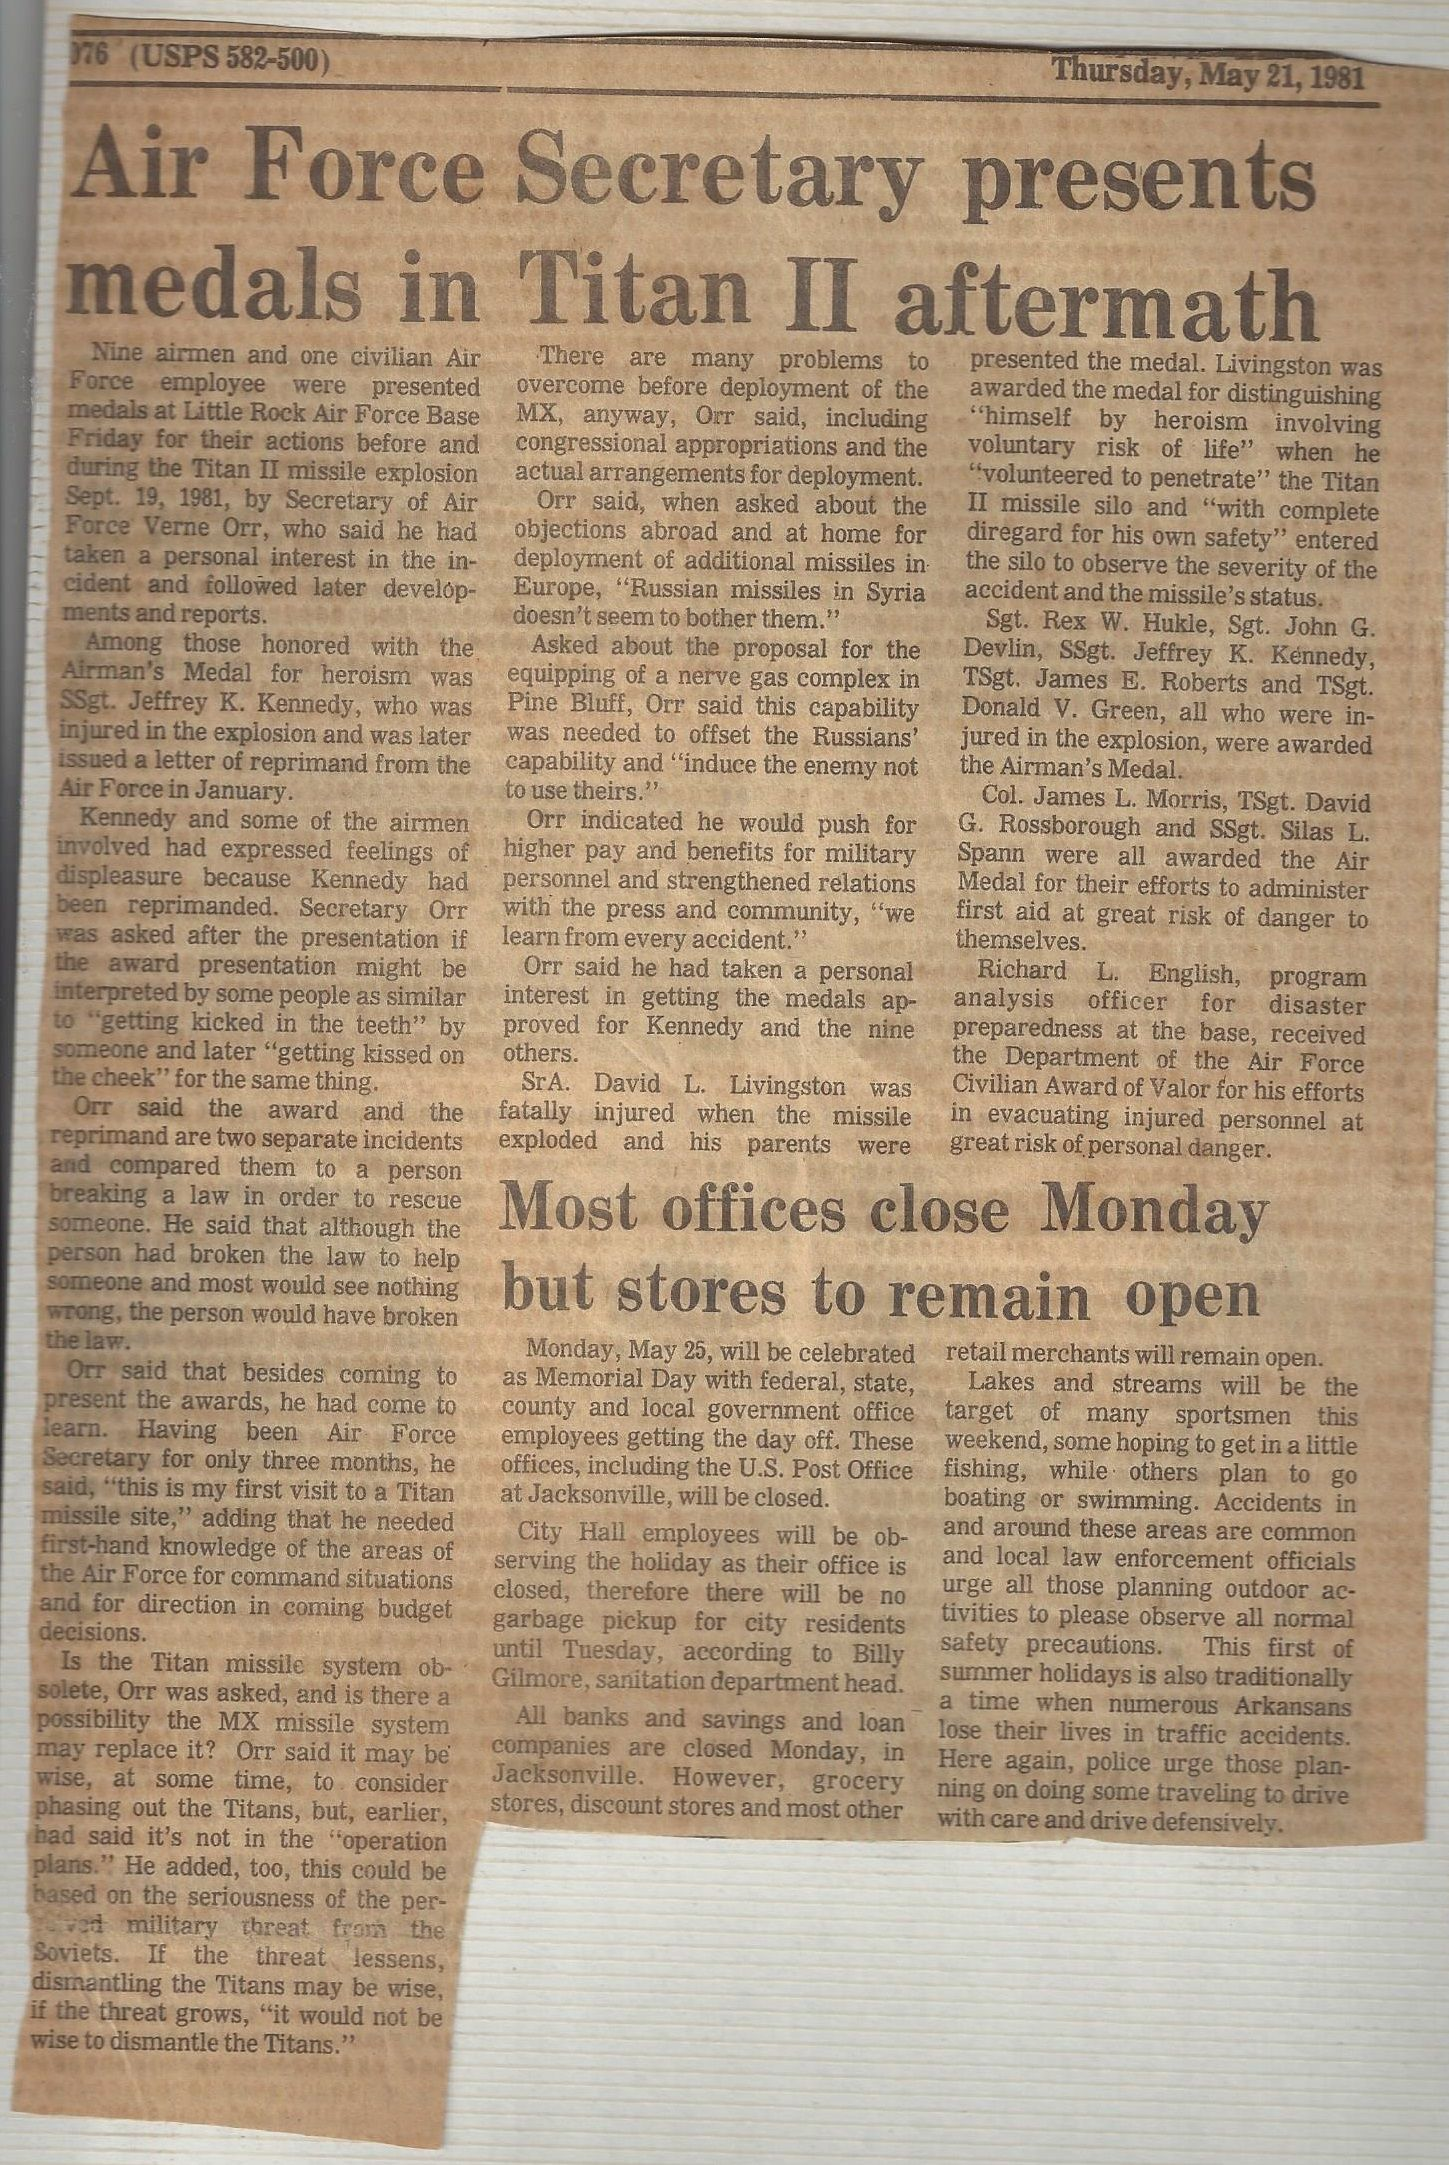 Arkansas Gazette News Article regarding the AIRMAN'S